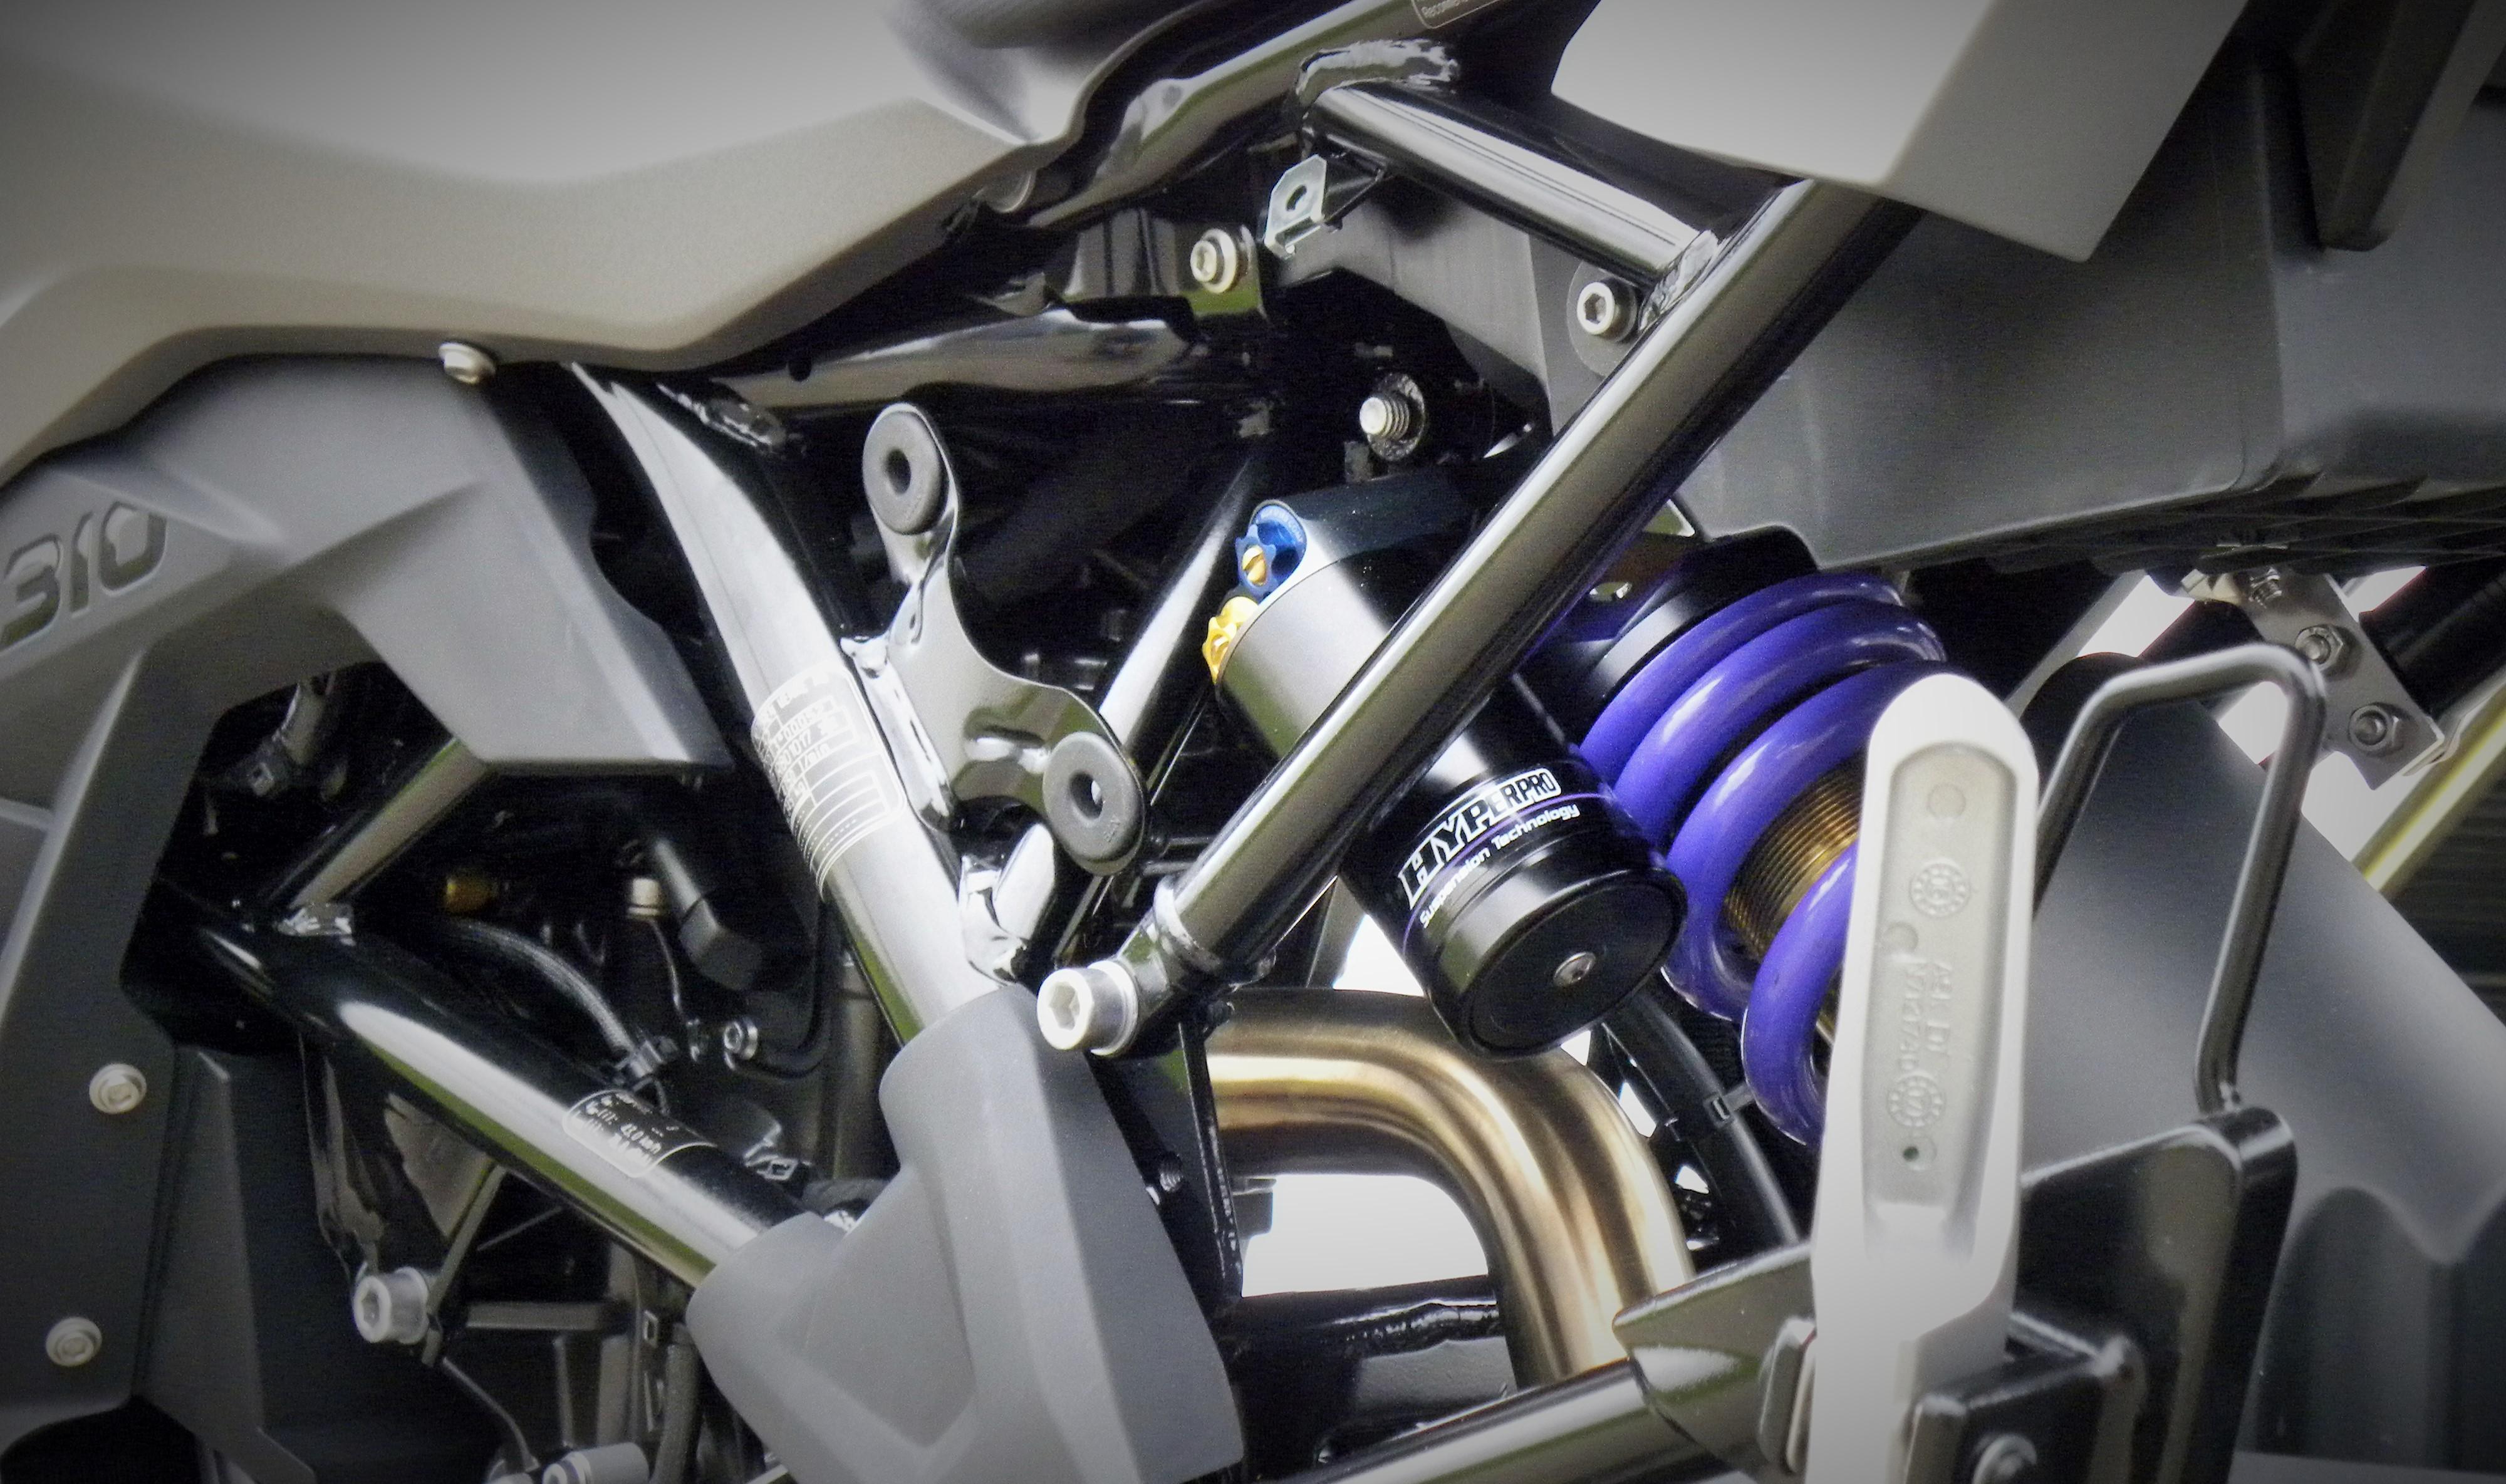 BMW G310 GS suspension solutions - Hyperpro